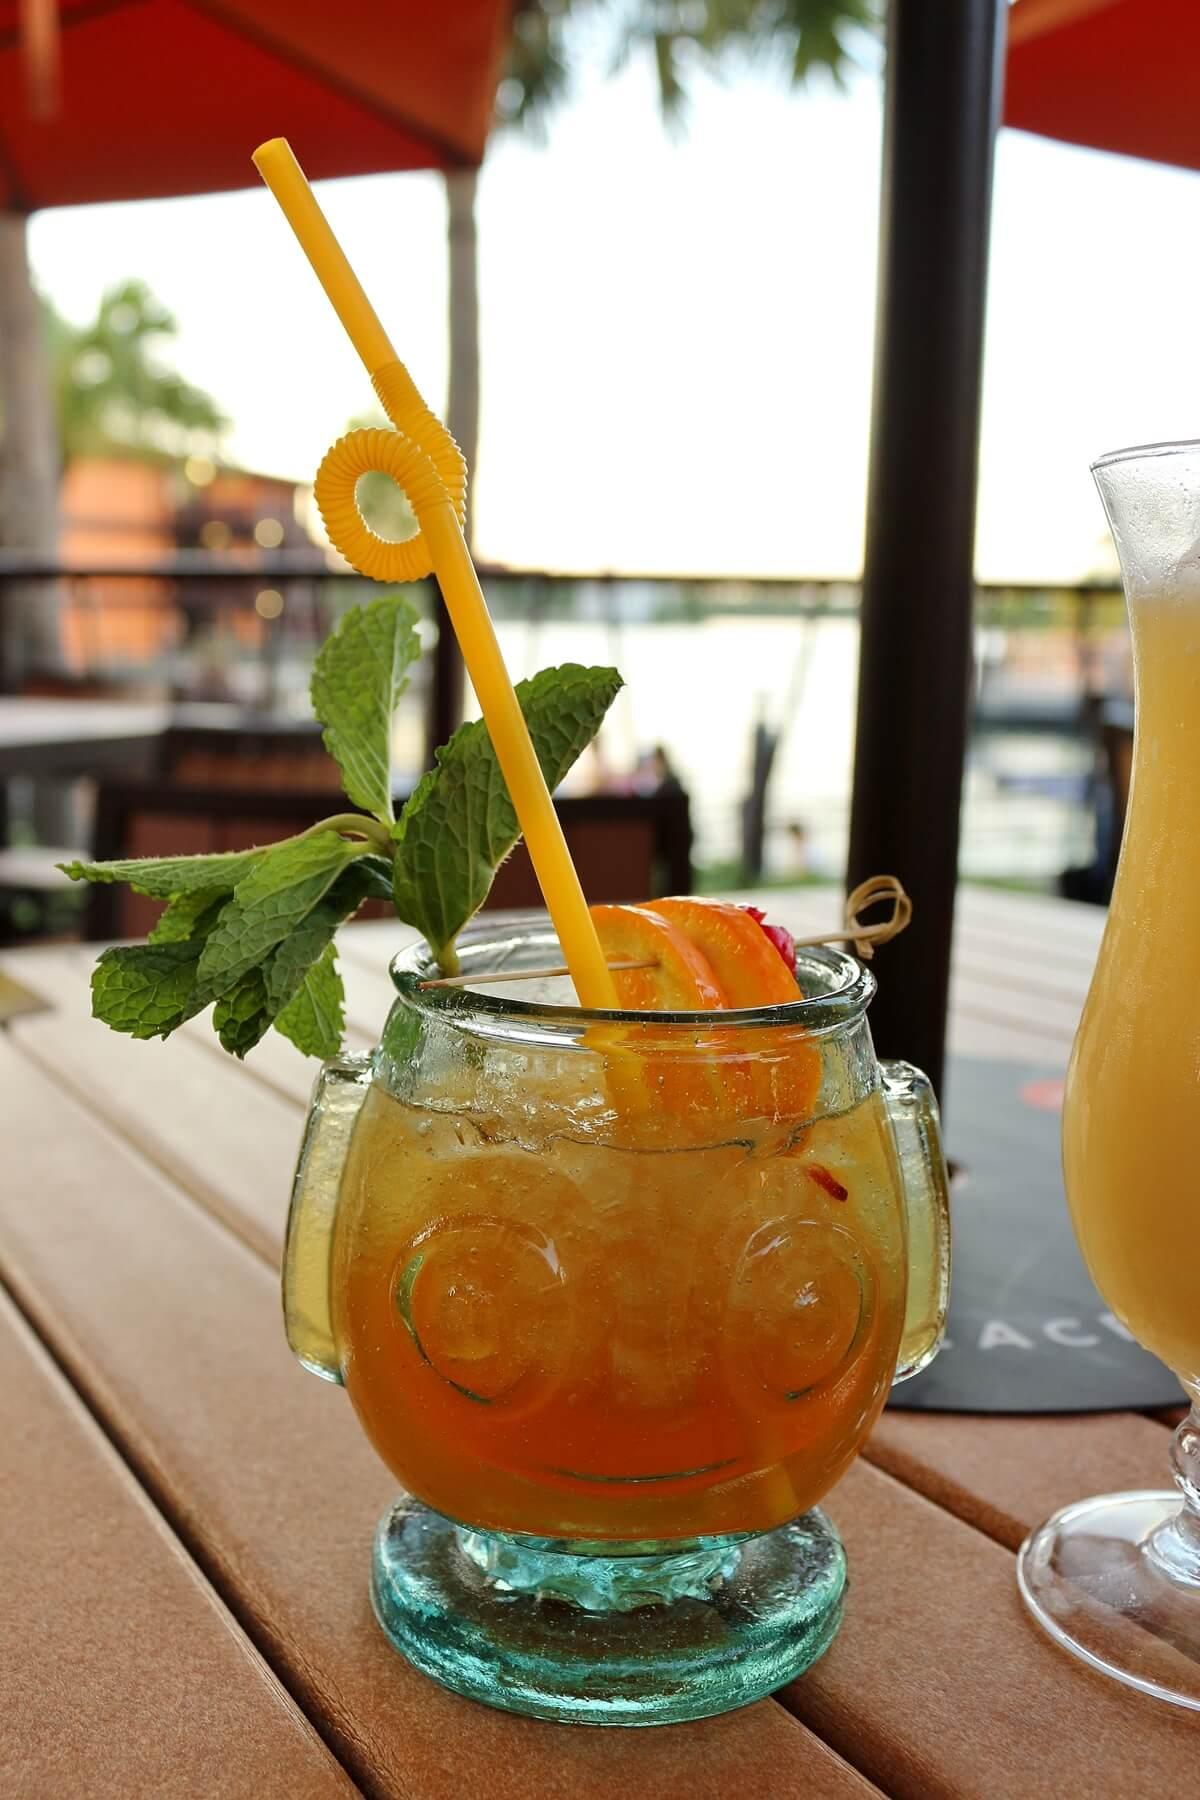 a HippopotoMai-Tai tiki drink served at Trader Sam's Tiki Terrace at Disney World